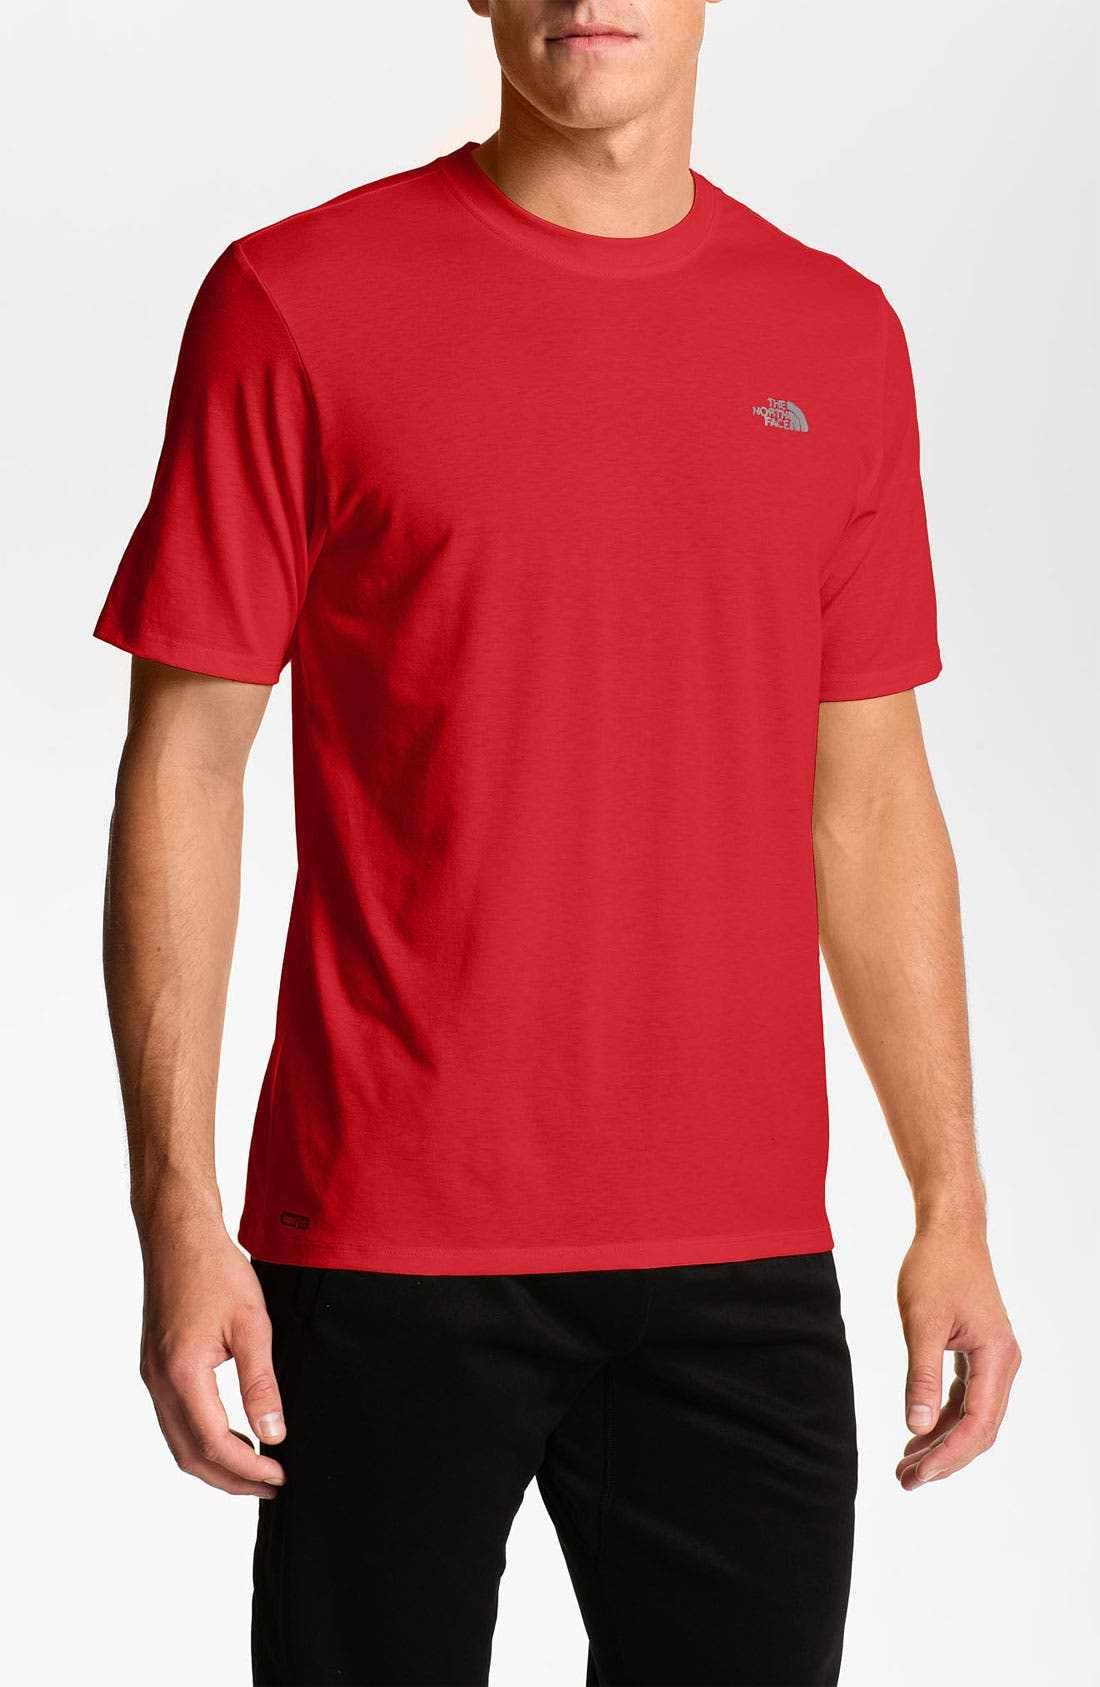 Alternate Image 1 Selected - The North Face 'Reaxion' VaporWick® Crewneck Shirt